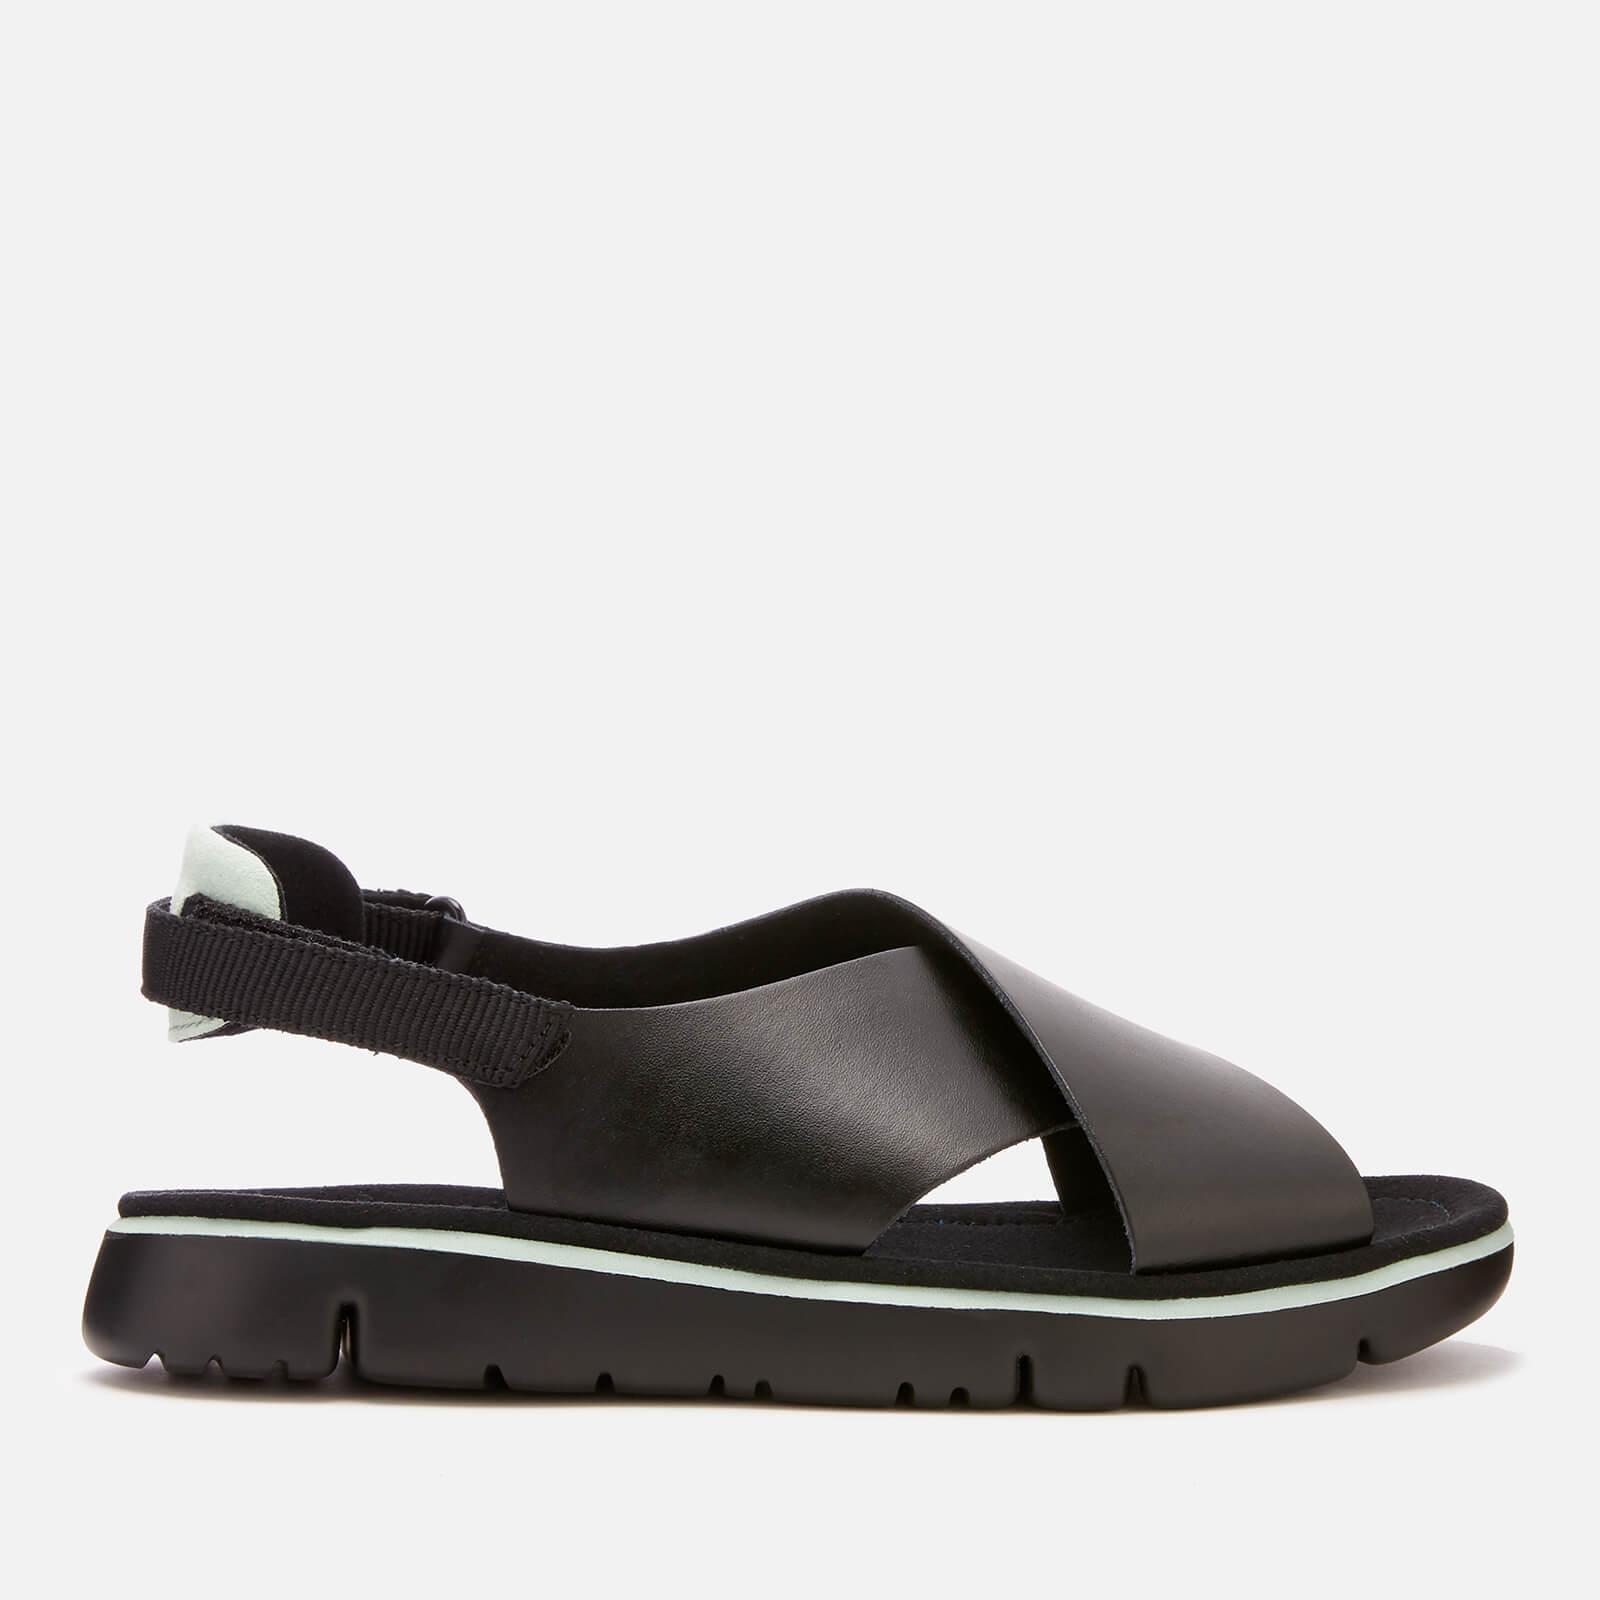 66454572ac91 Lyst - Camper Oruga Cross Front Sandals in Black